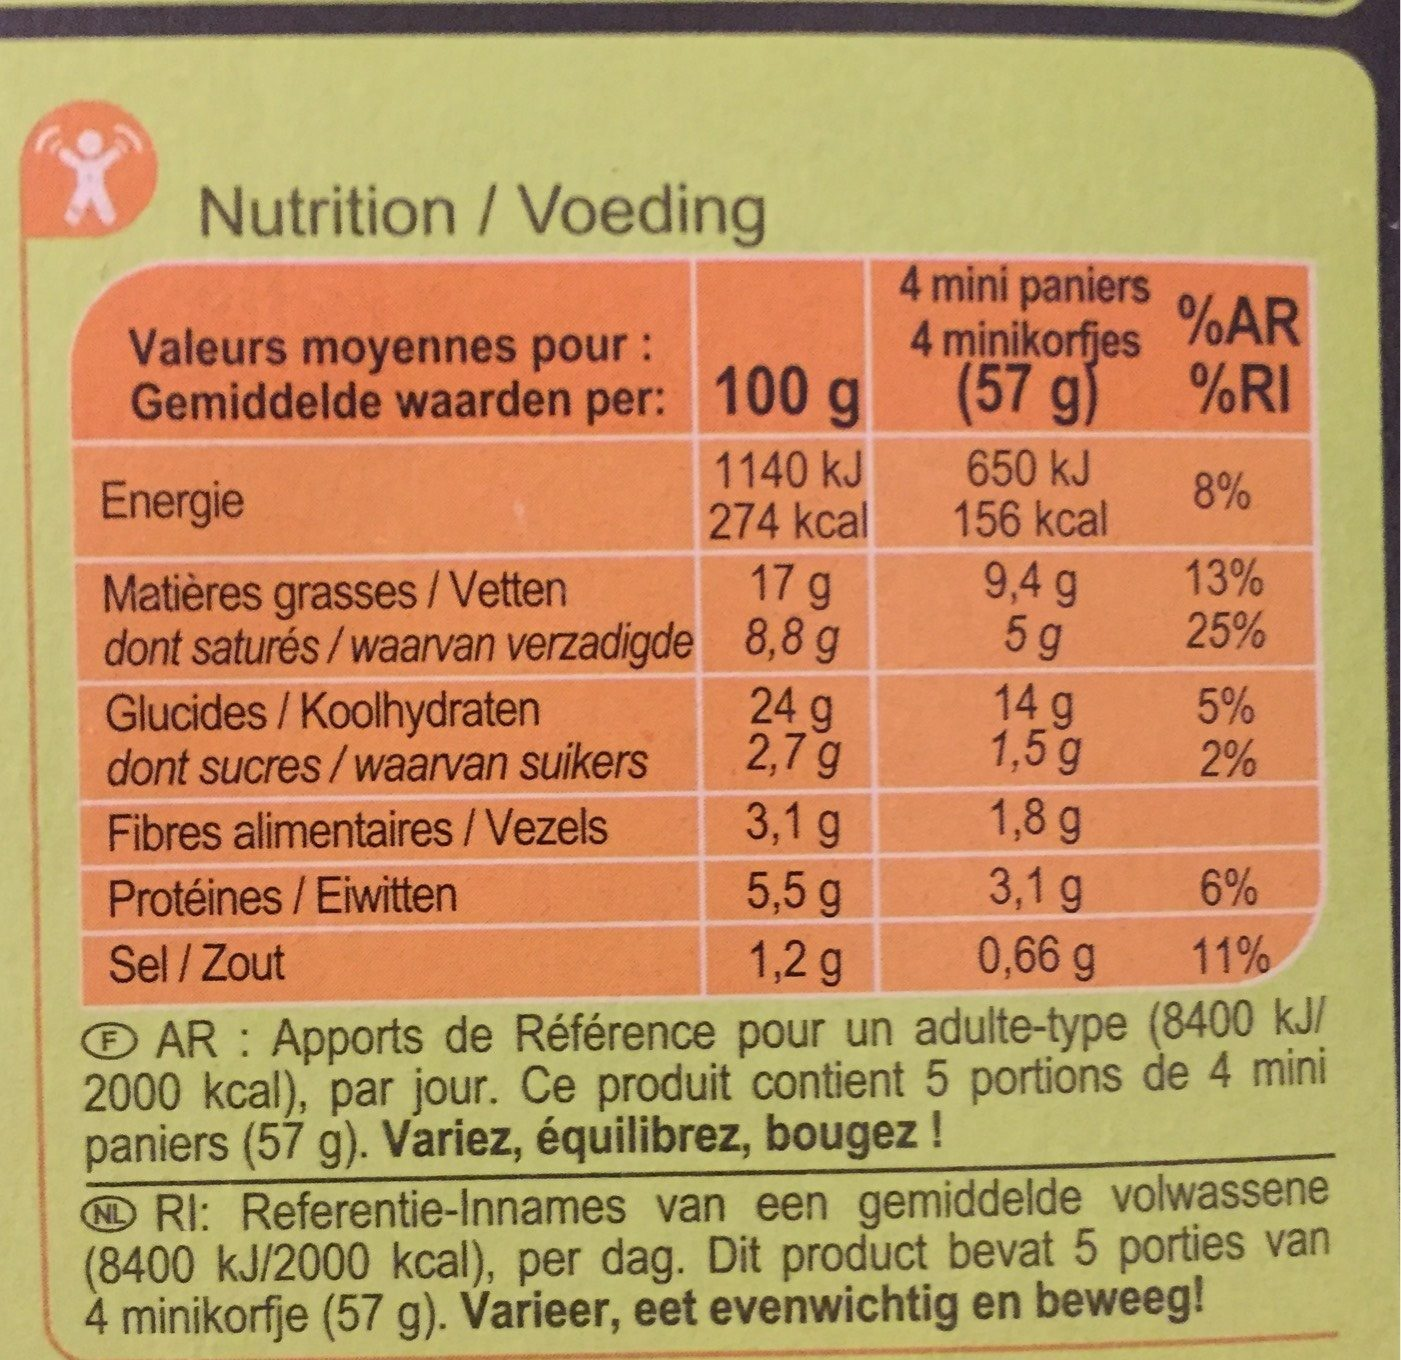 Mini paniers Les Aperitifs - Nutrition facts - fr